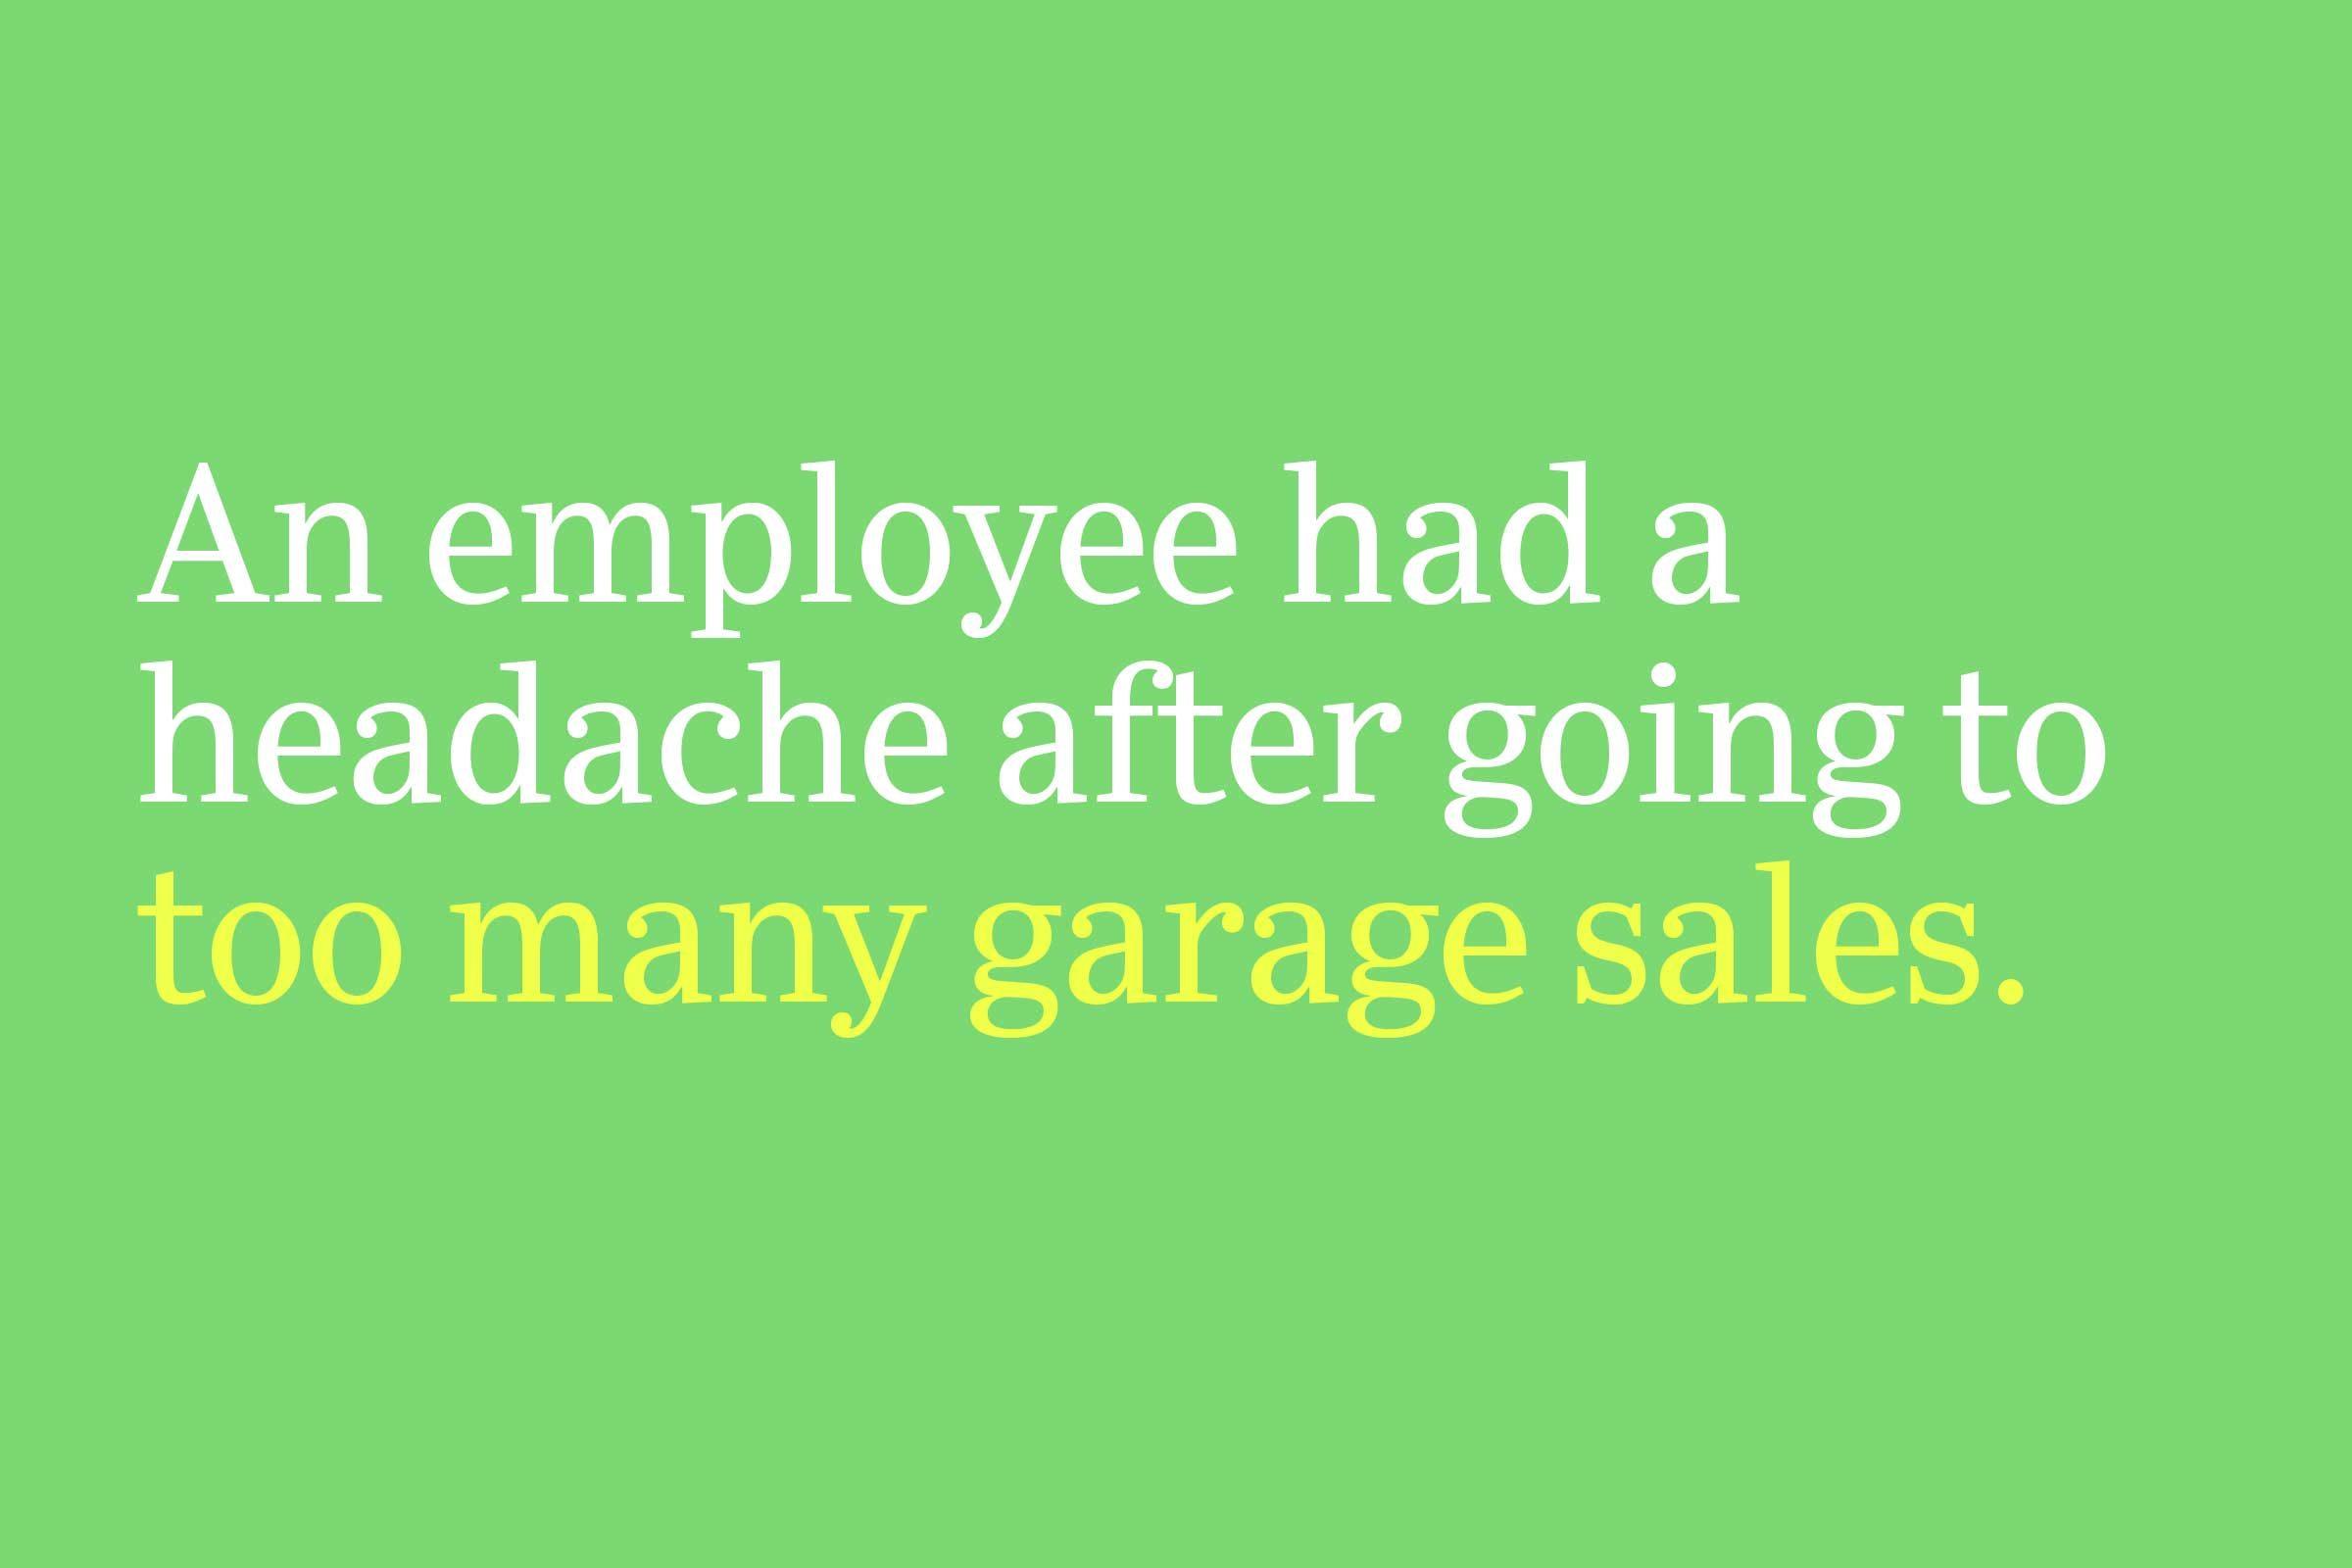 too many garage sales